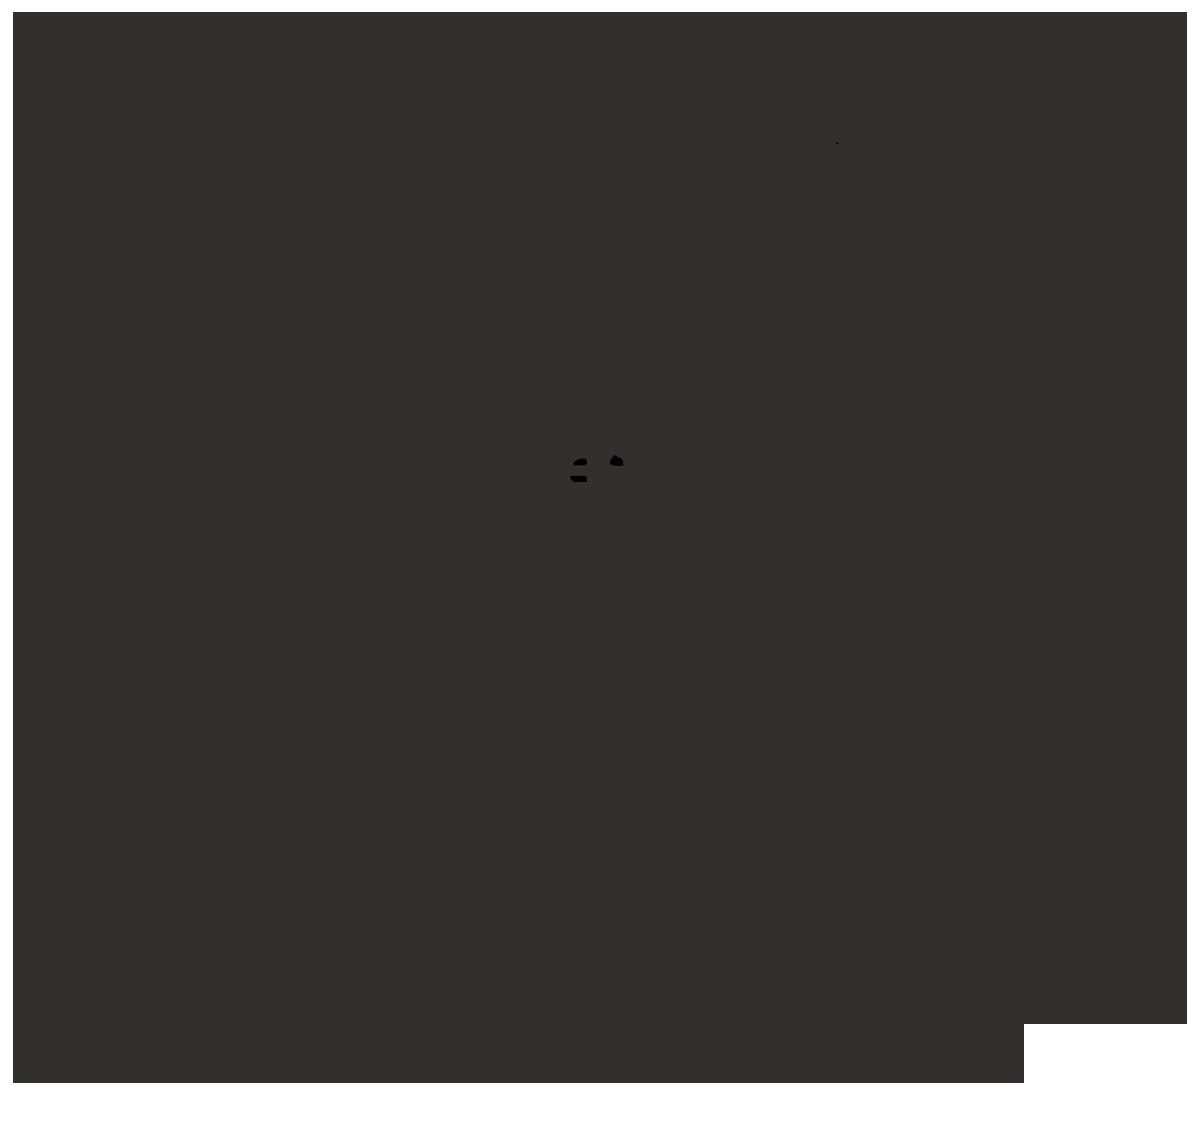 Berta Garces Lardies